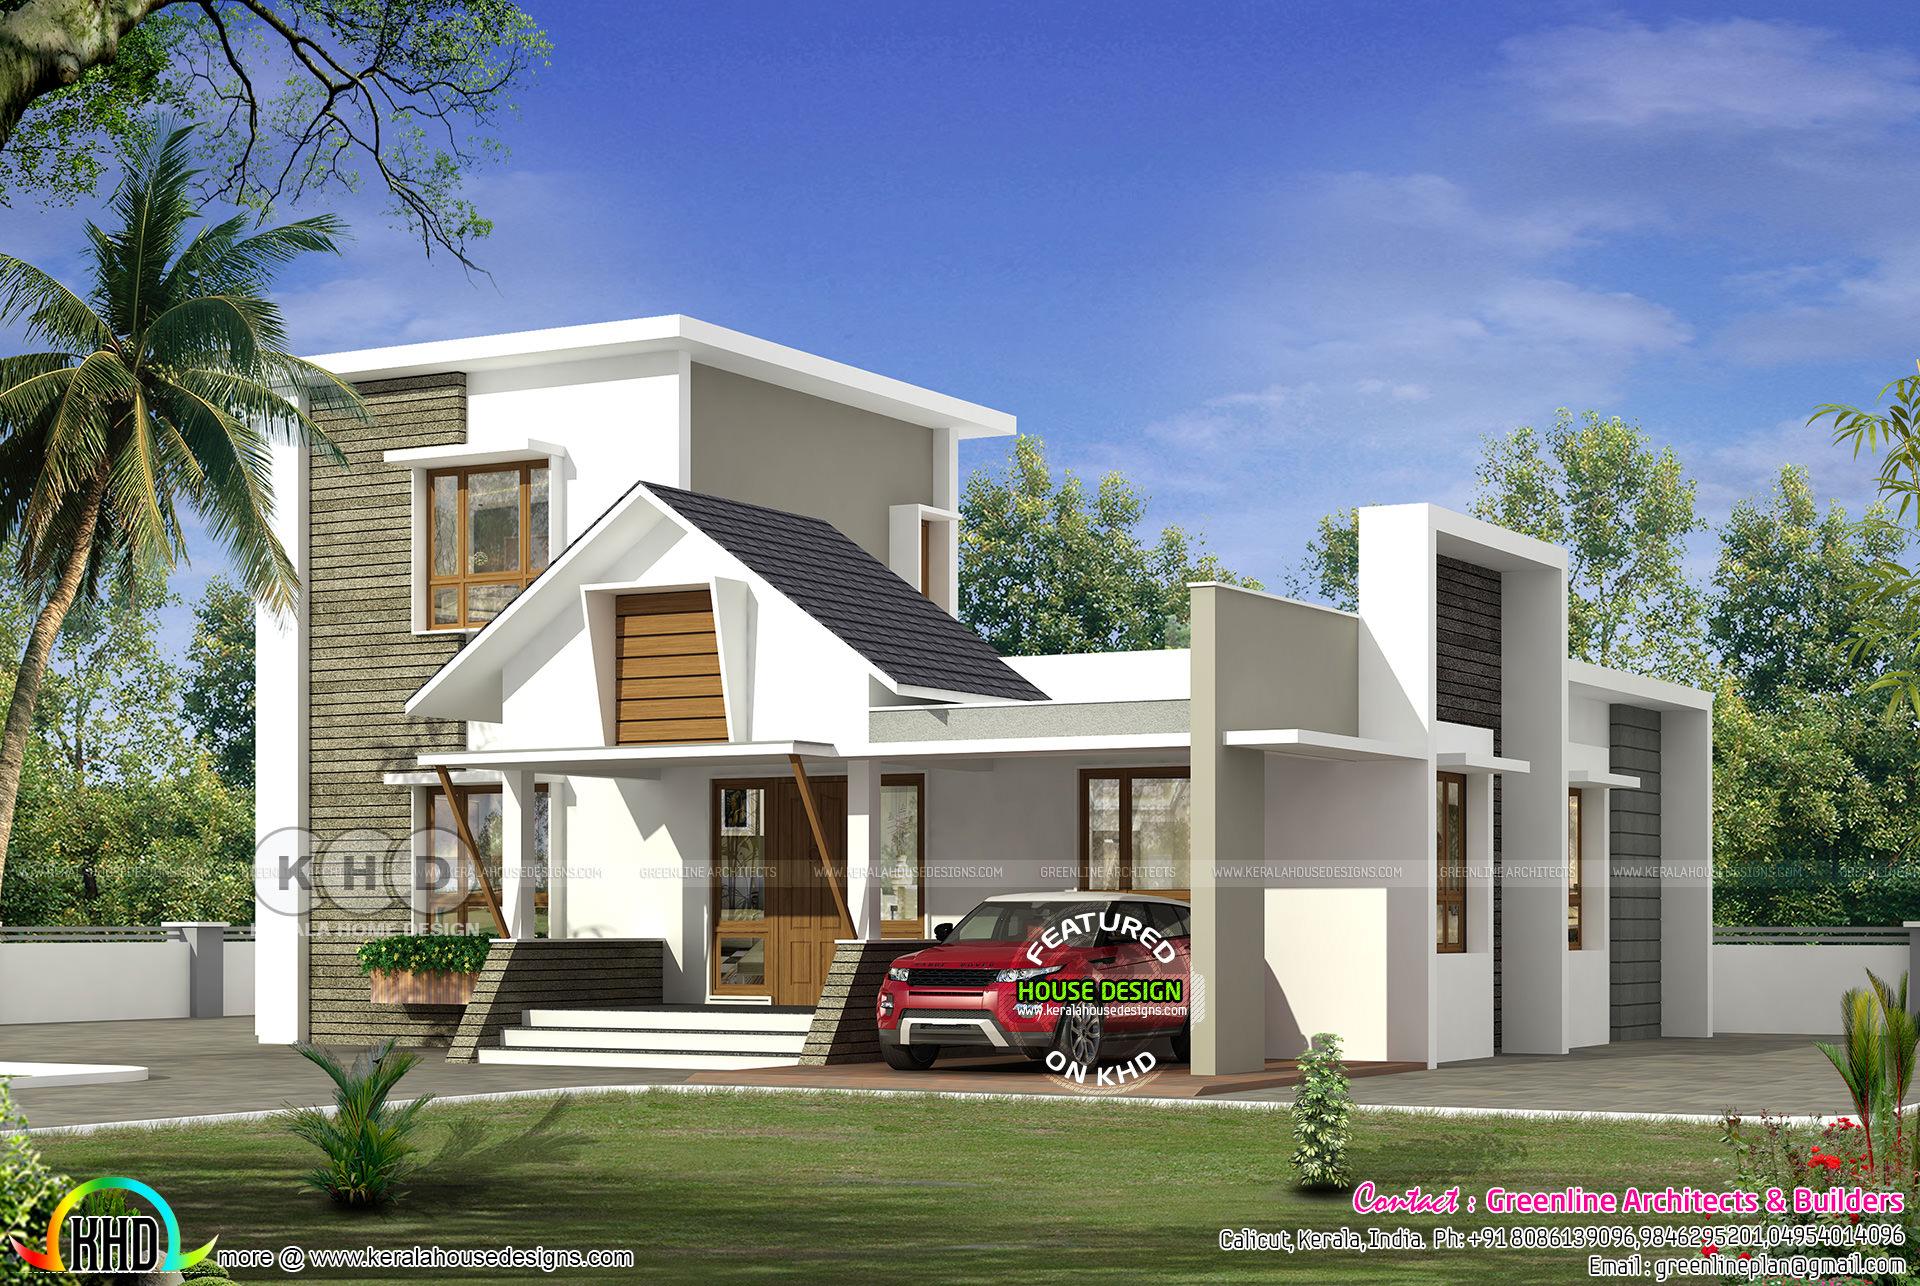 1810 Square Feet 4 Bedroom Modern Home Kerala Home